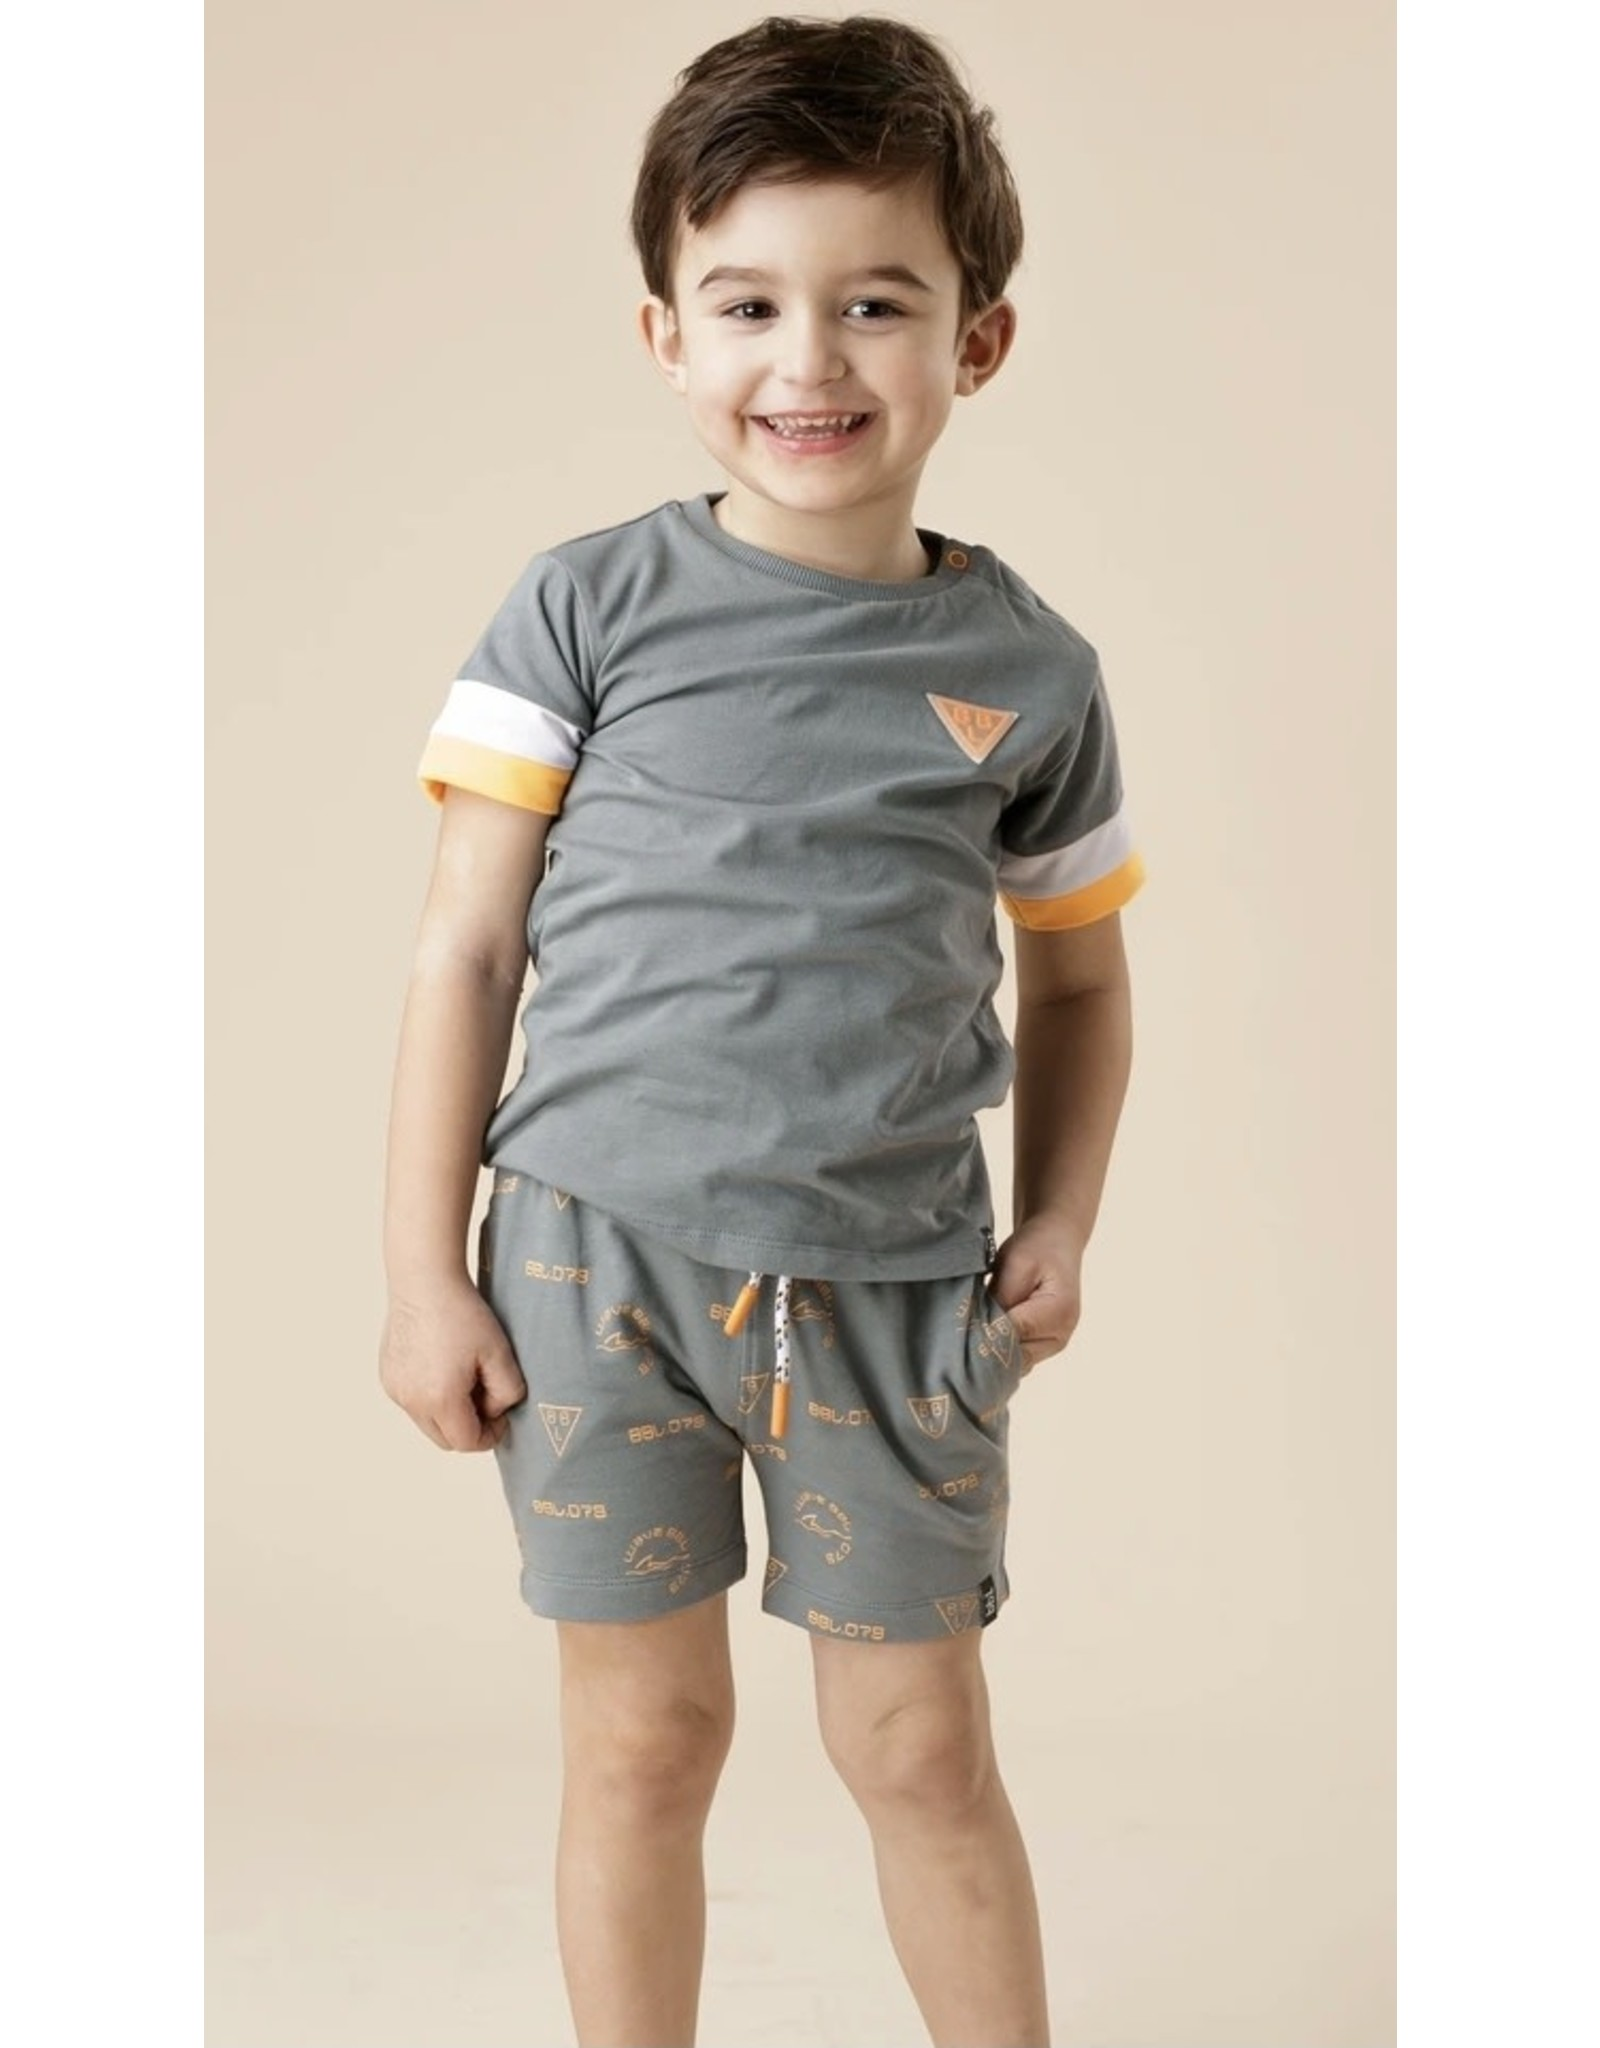 Beebielove 2604 T-shirt